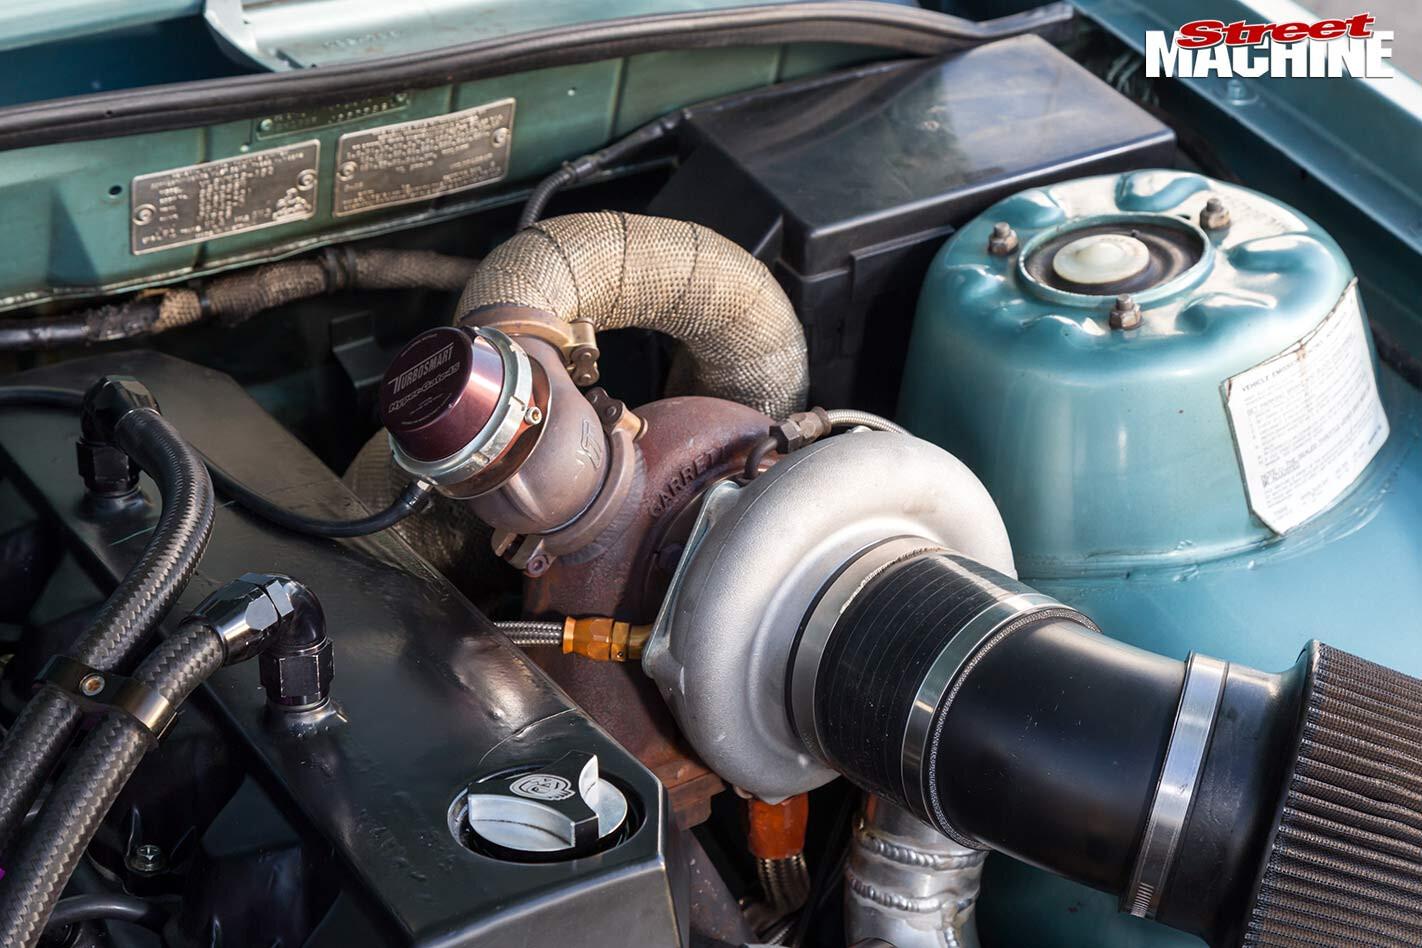 Holden VL Commodore engine bay